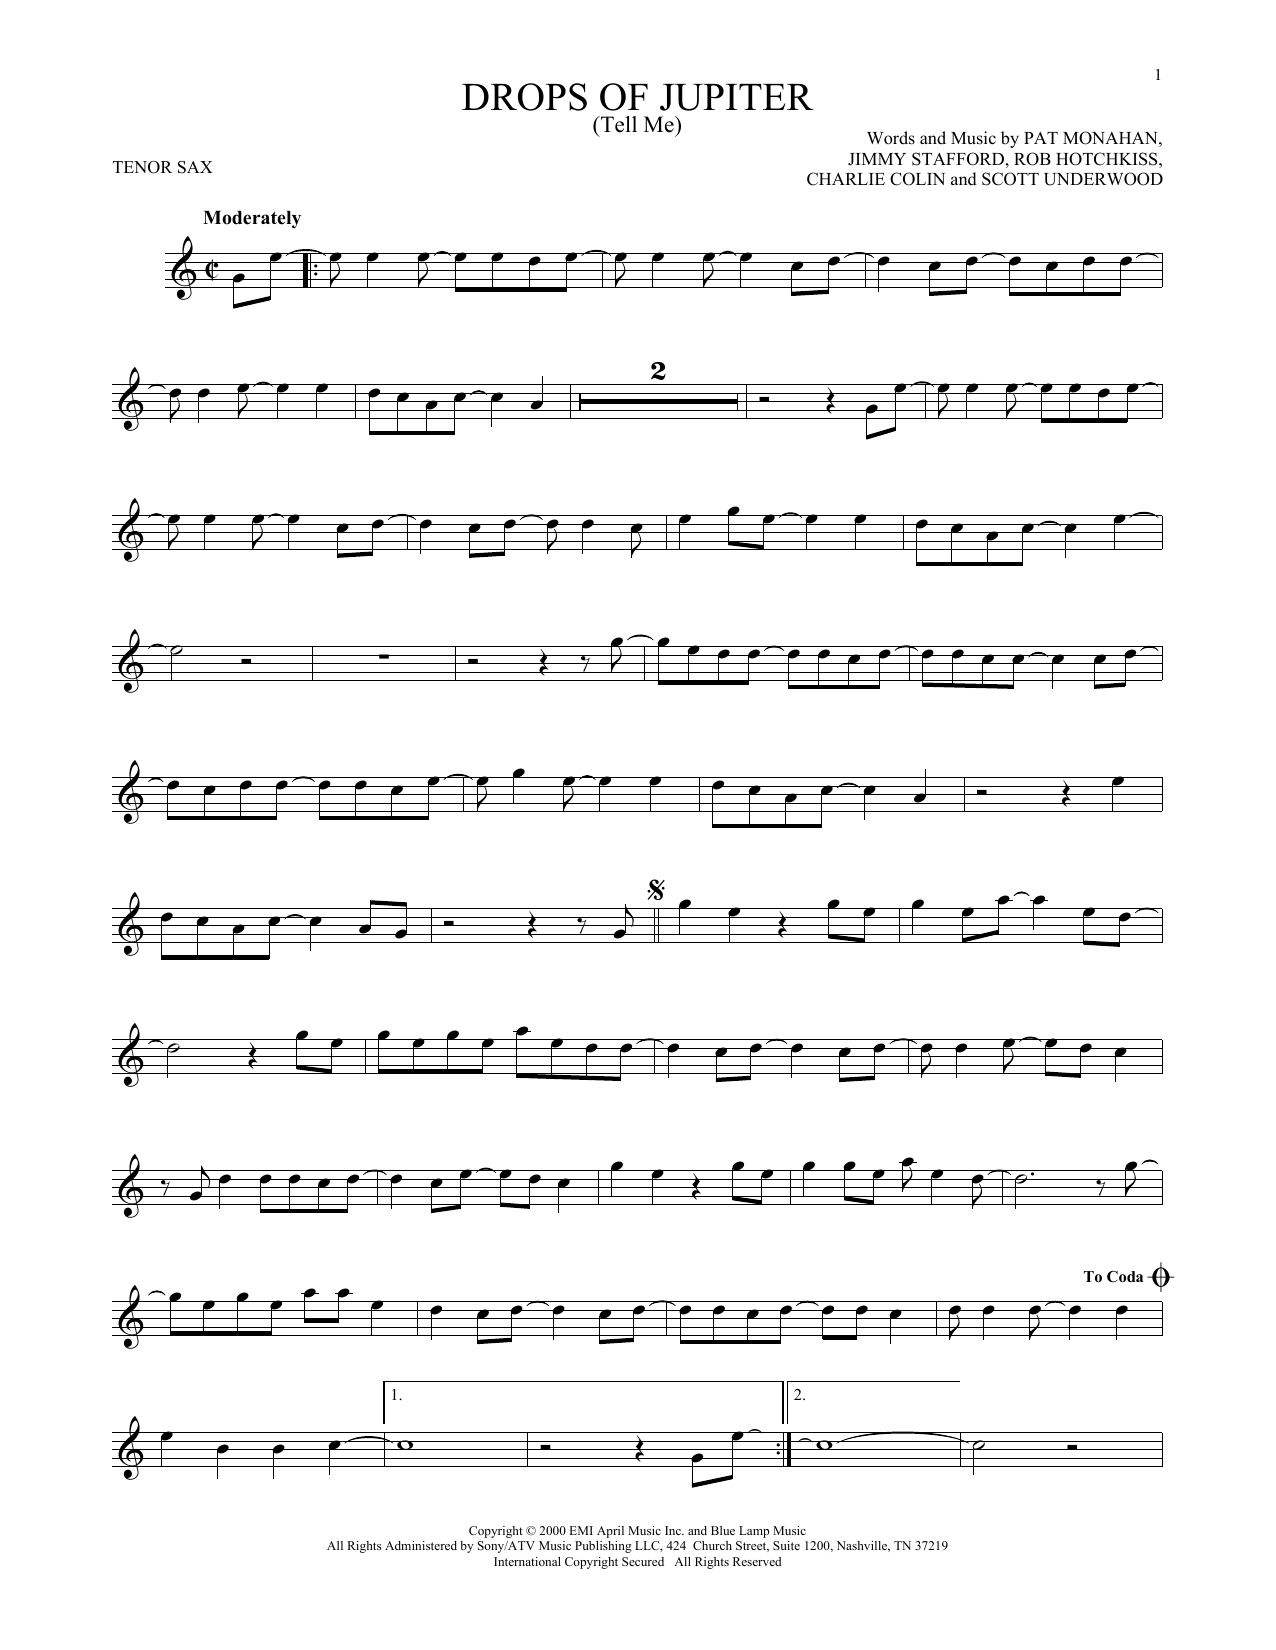 Drops Of Jupiter Chords Sheet Music Digital Files To Print Licensed Scott Underwood